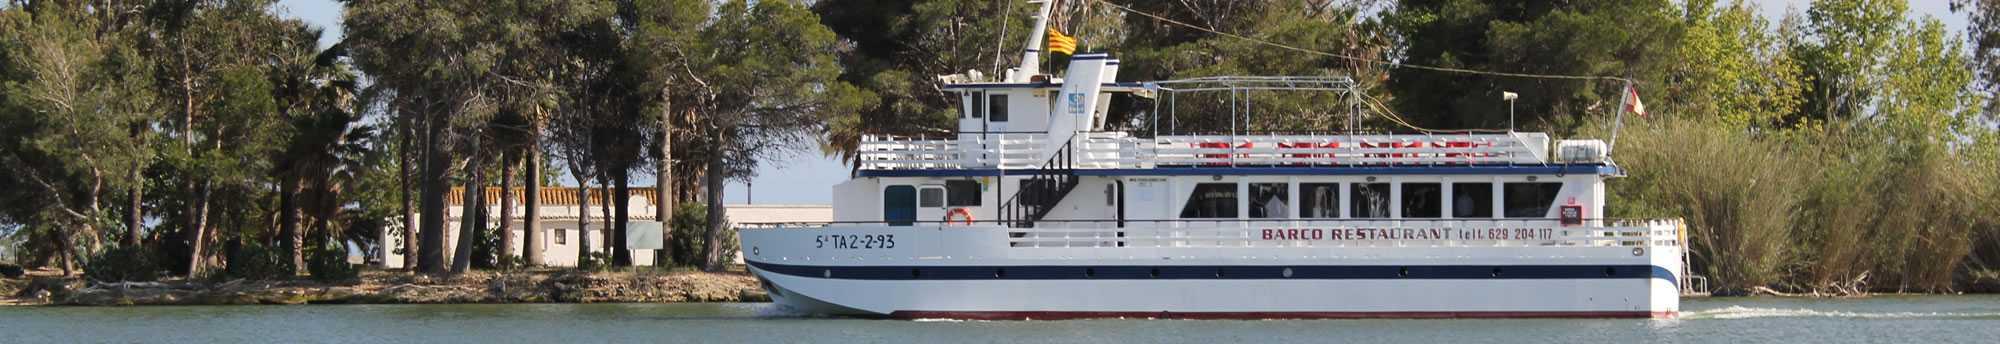 Crucero en el Parque Natural Delta del Ebro